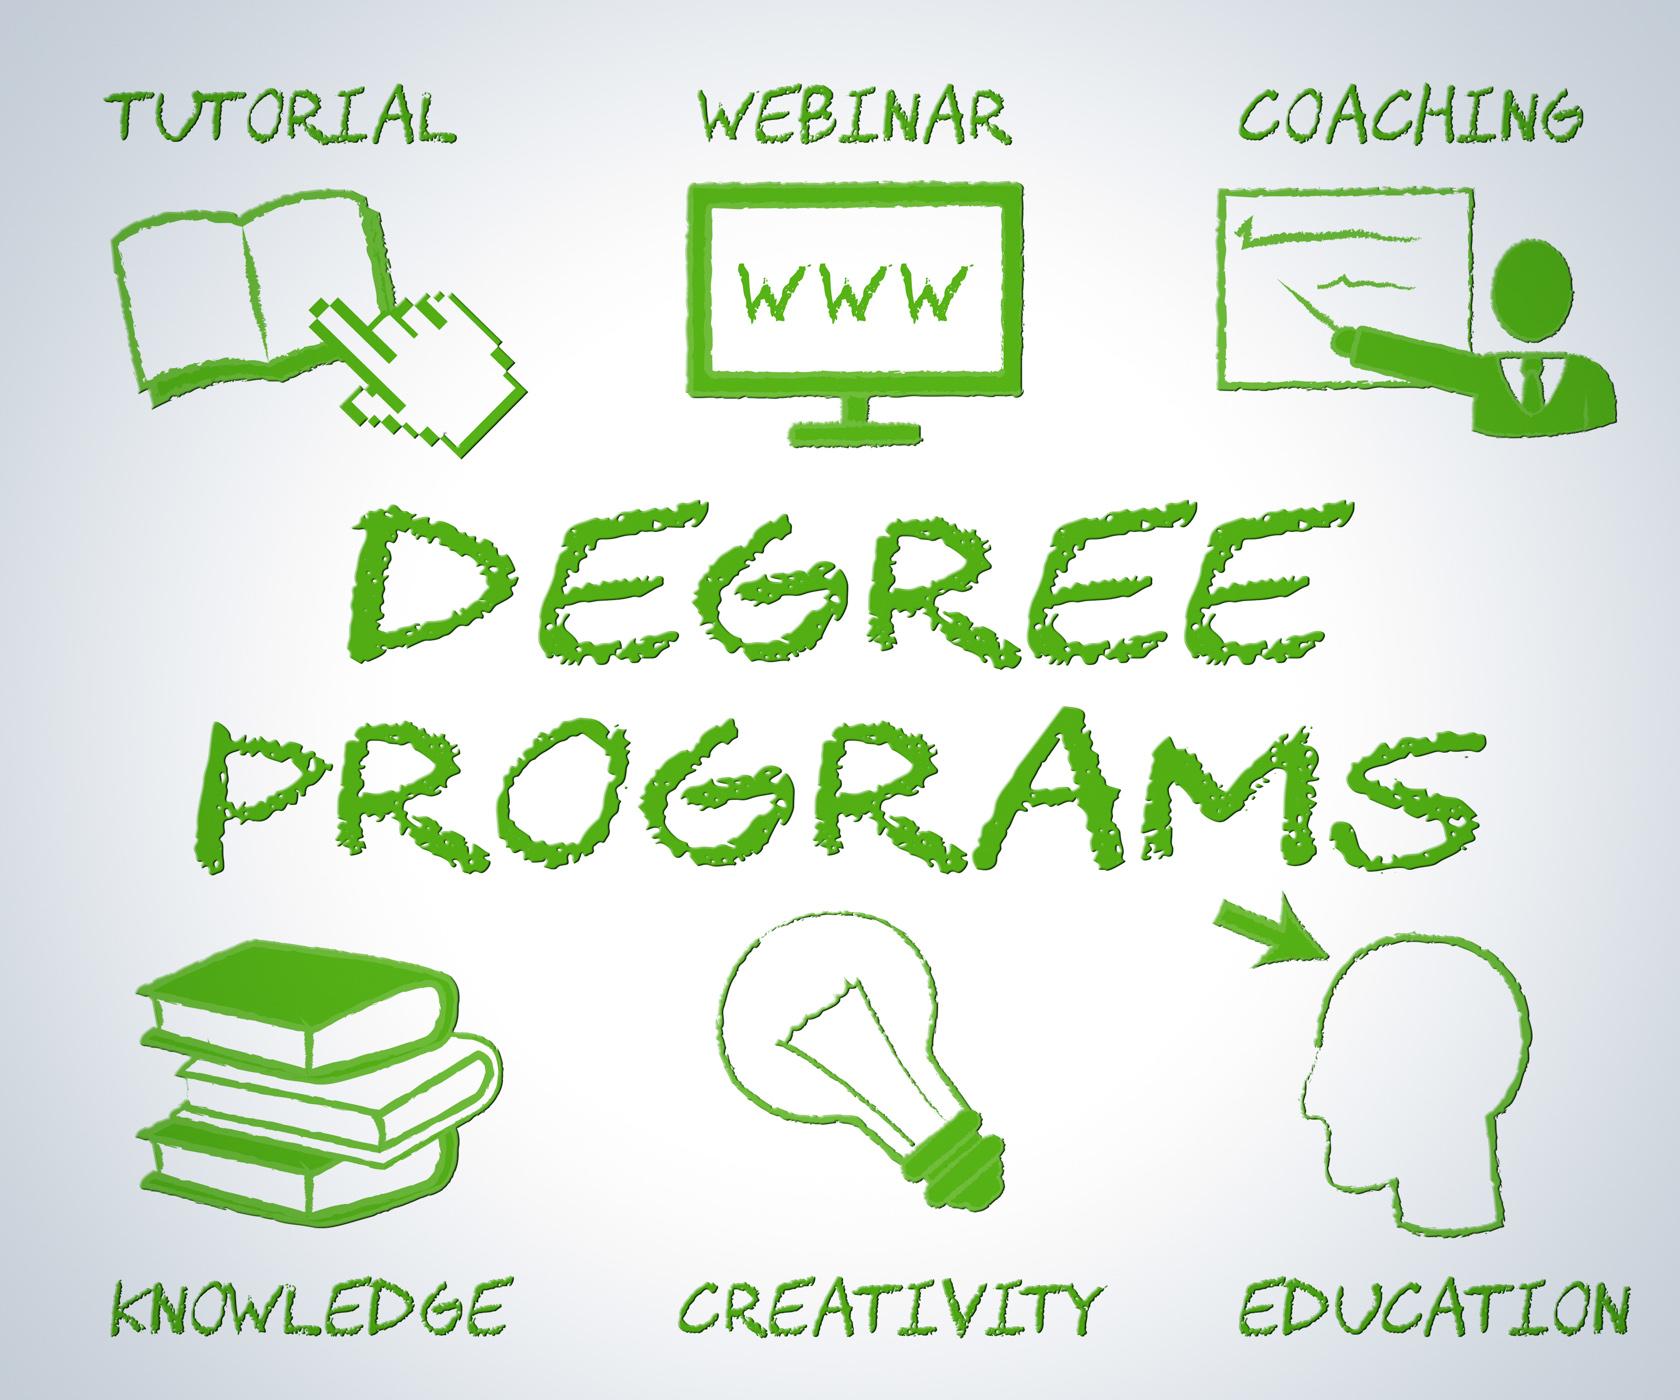 Degree programs shows web site and associates photo